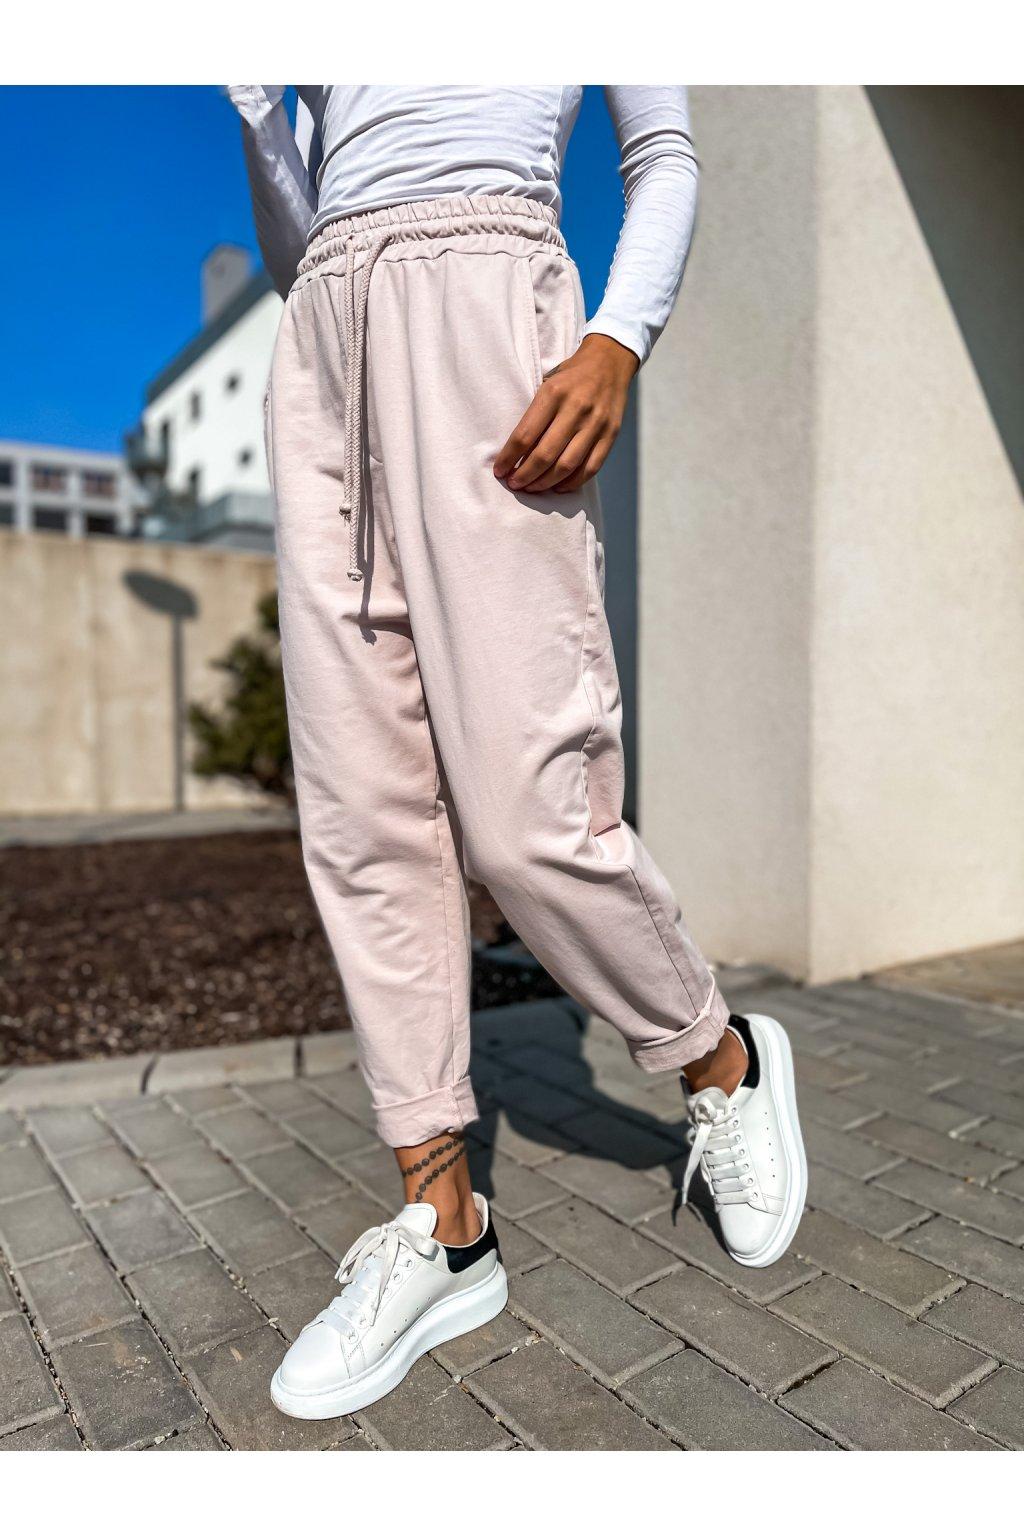 damske teplakove kalhoty dastin light pink eshopat cz 1